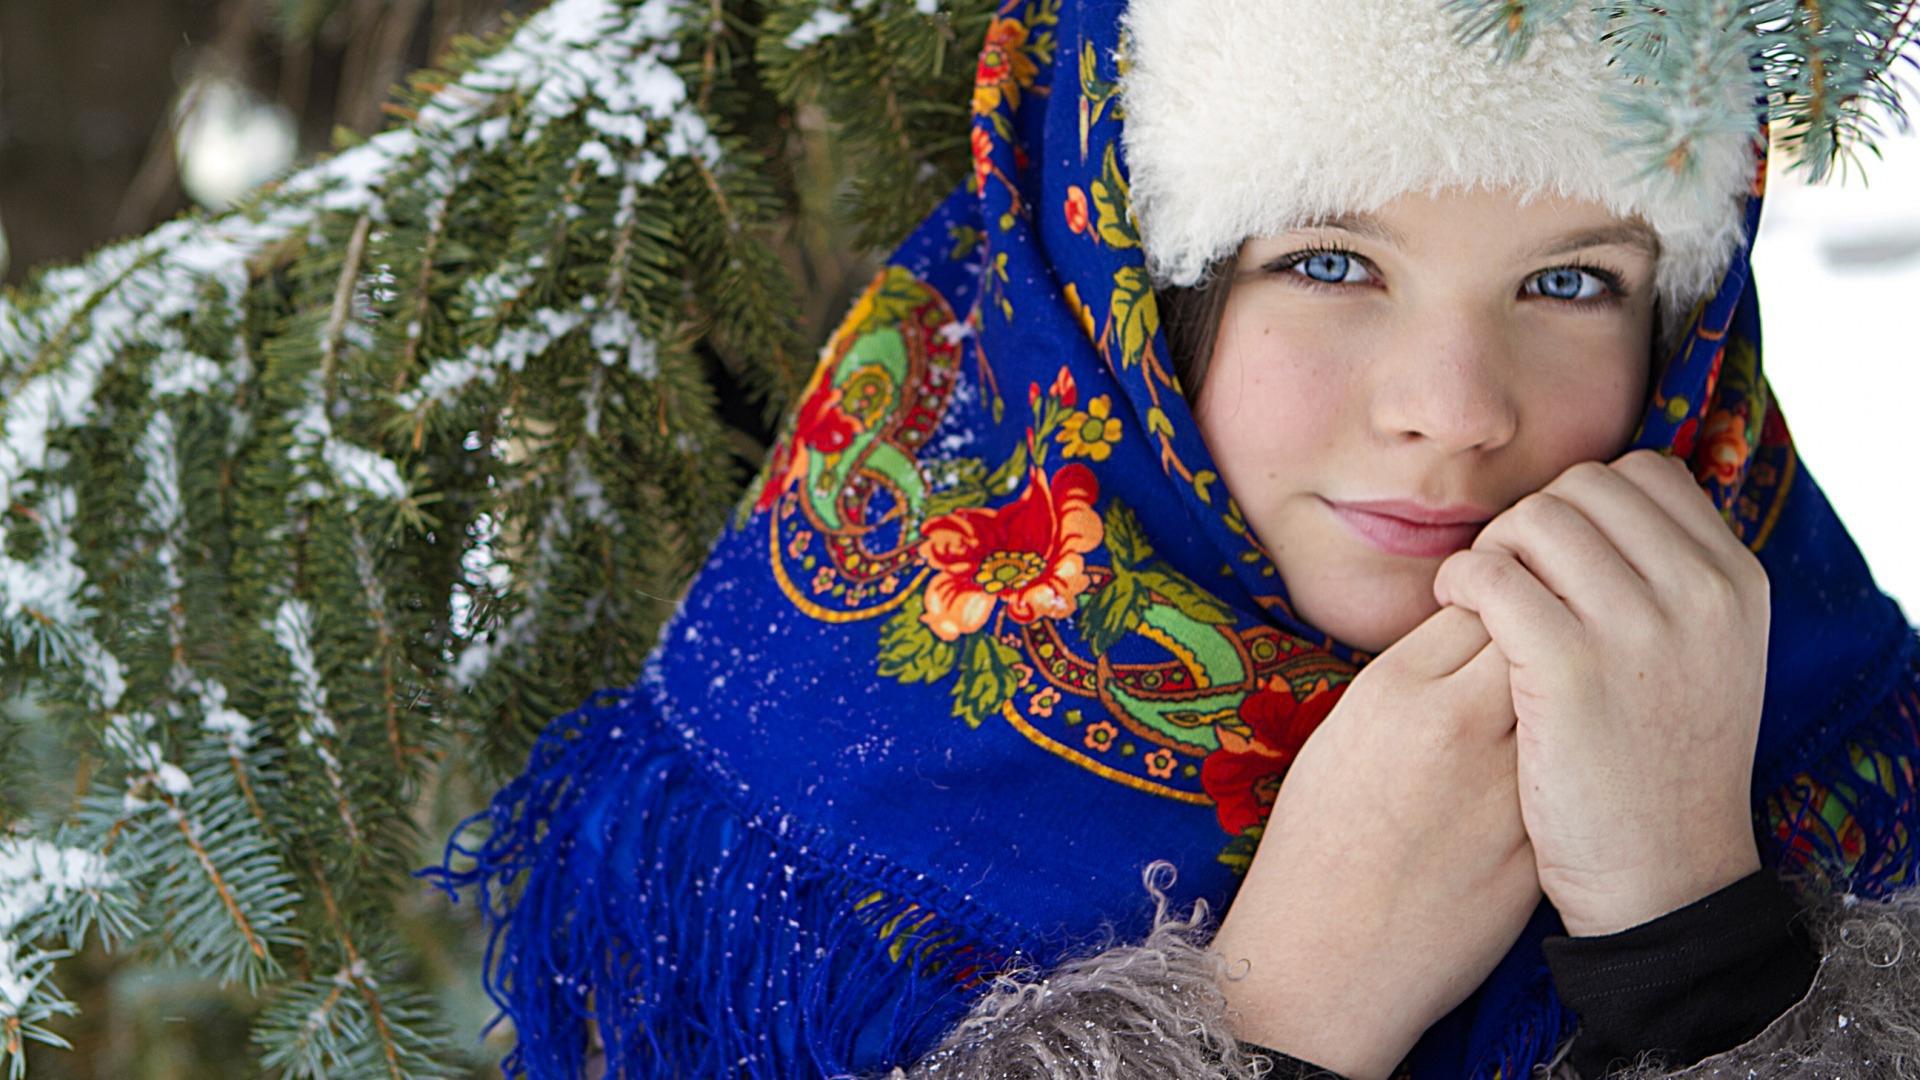 russkie-krasavitsi-onlayn-mulatka-rianna-erotika-foto